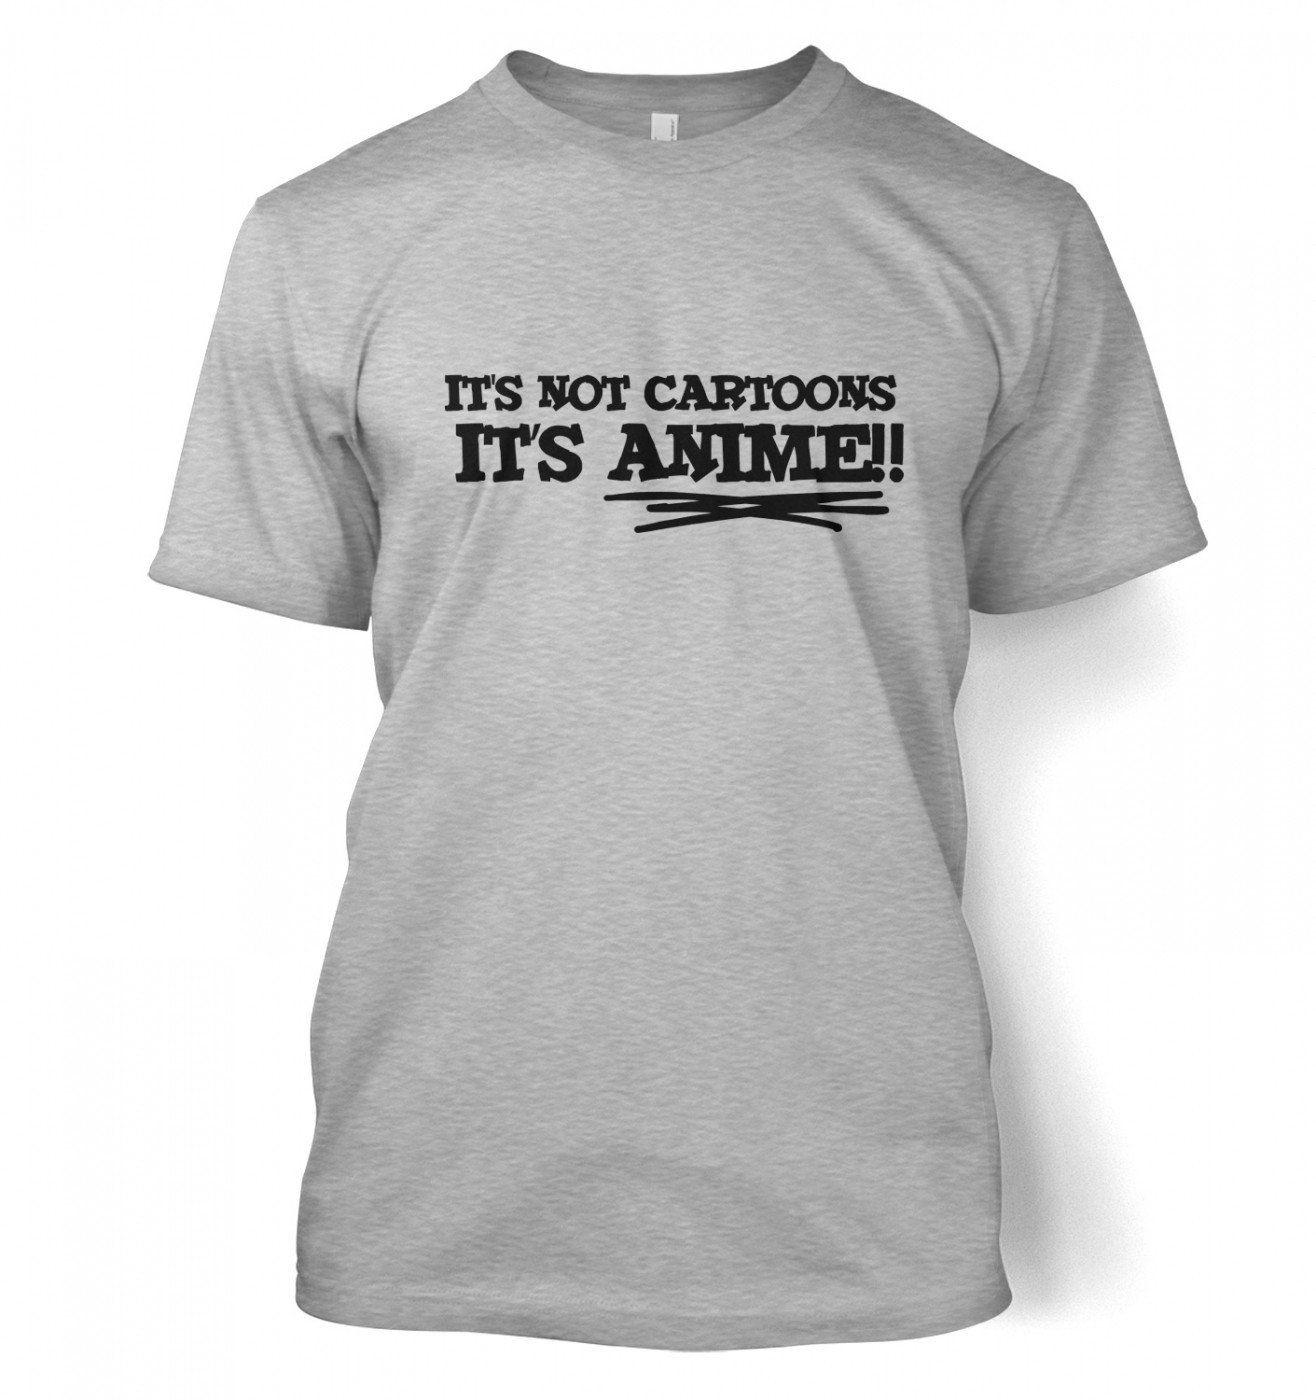 747dc15a Amazon.com: Its Not Cartoons! T-shirt - Japanese Anime Geeky Tshirt:  Clothing